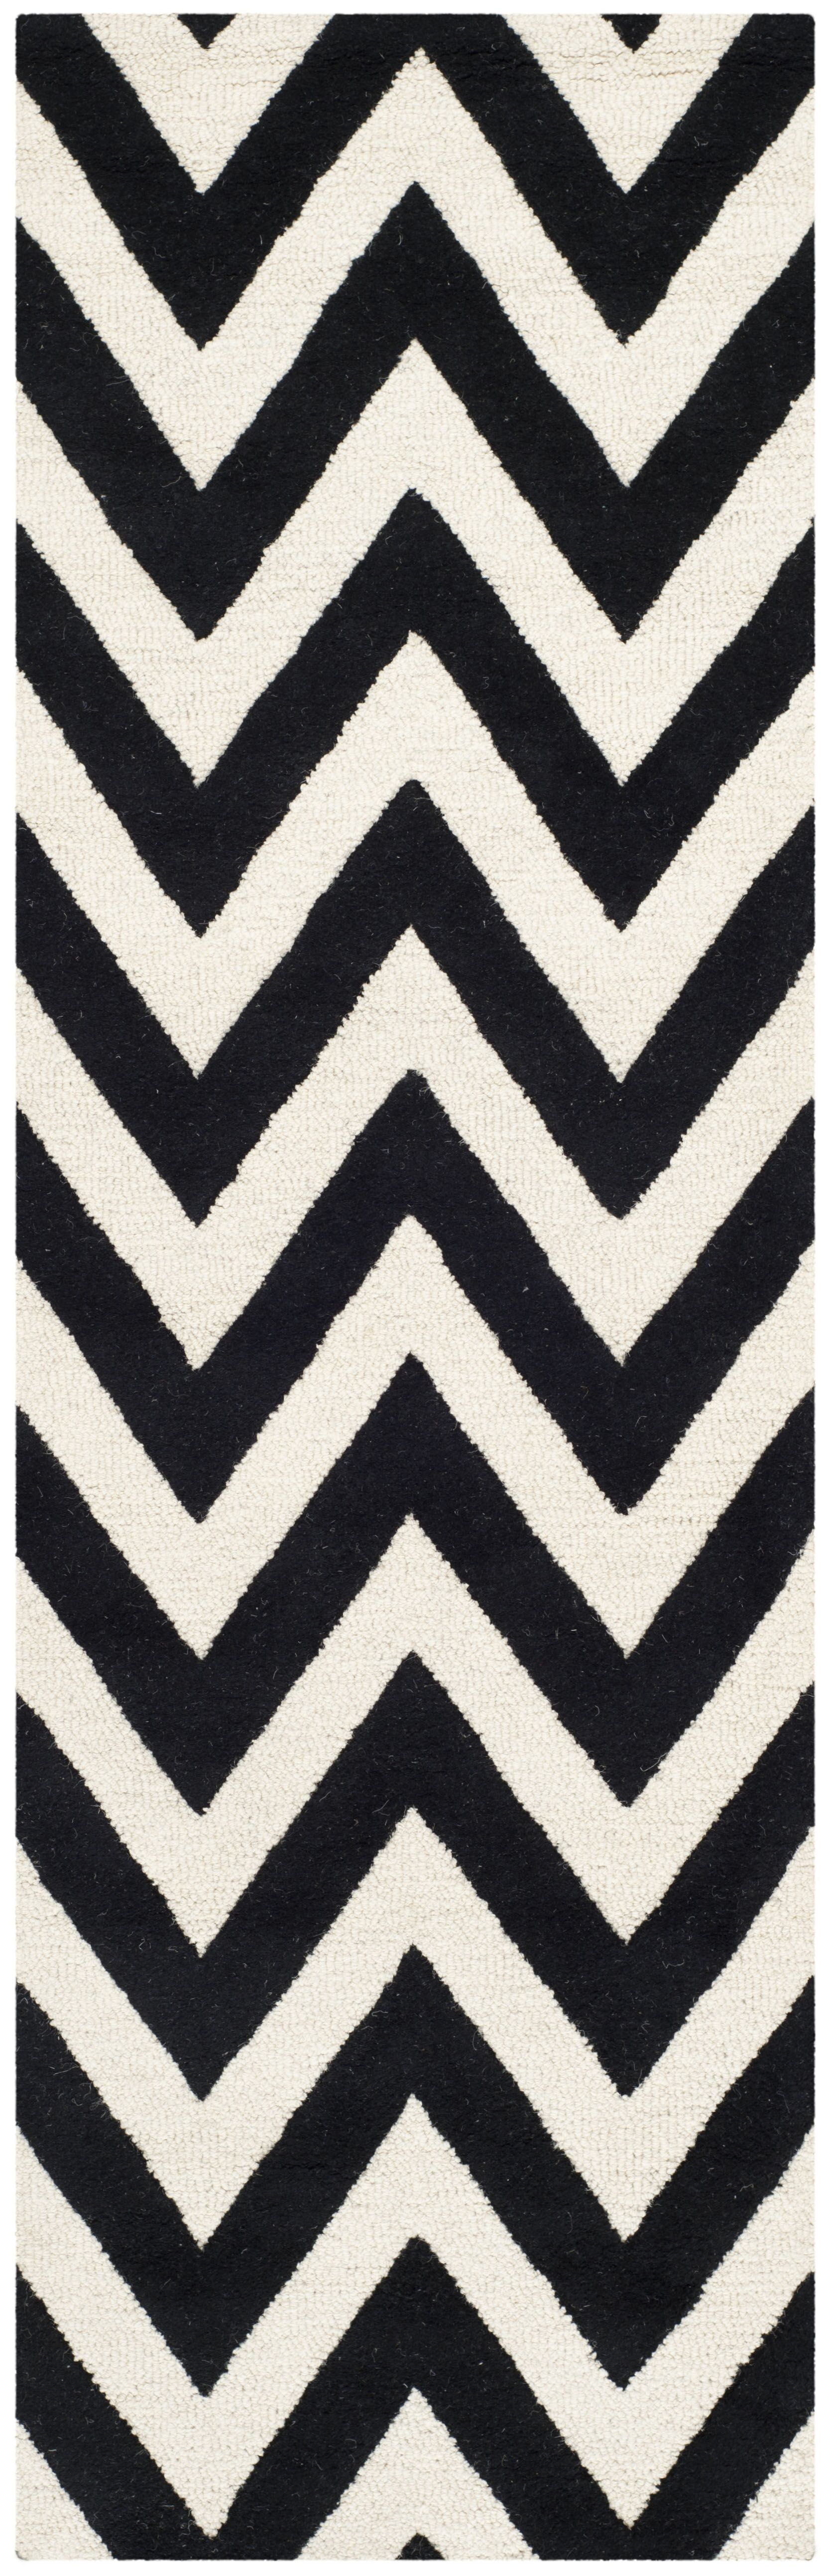 Daveney Hand-Tufted Wool Black/Ivory Area Rug Rug Size: Runner 2'6